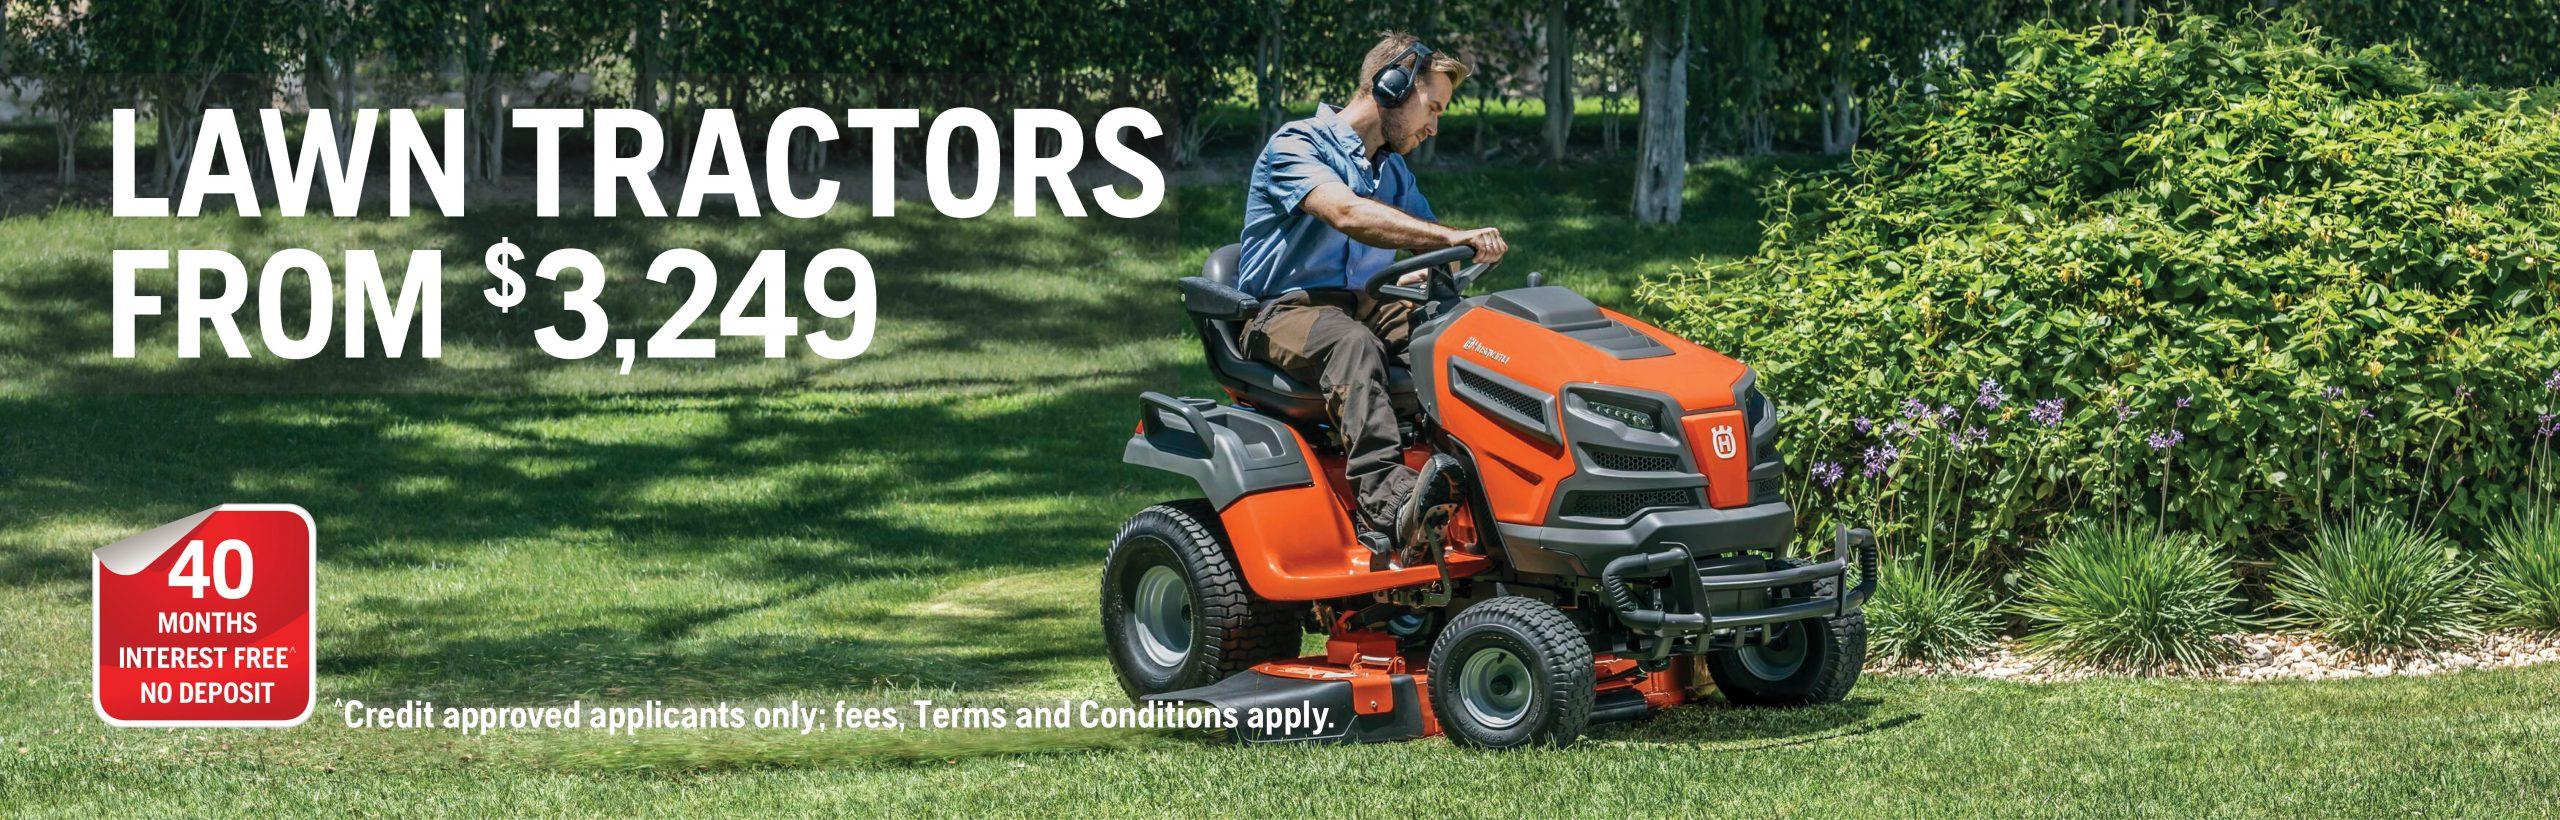 Spring 2020 - Lawn tractors